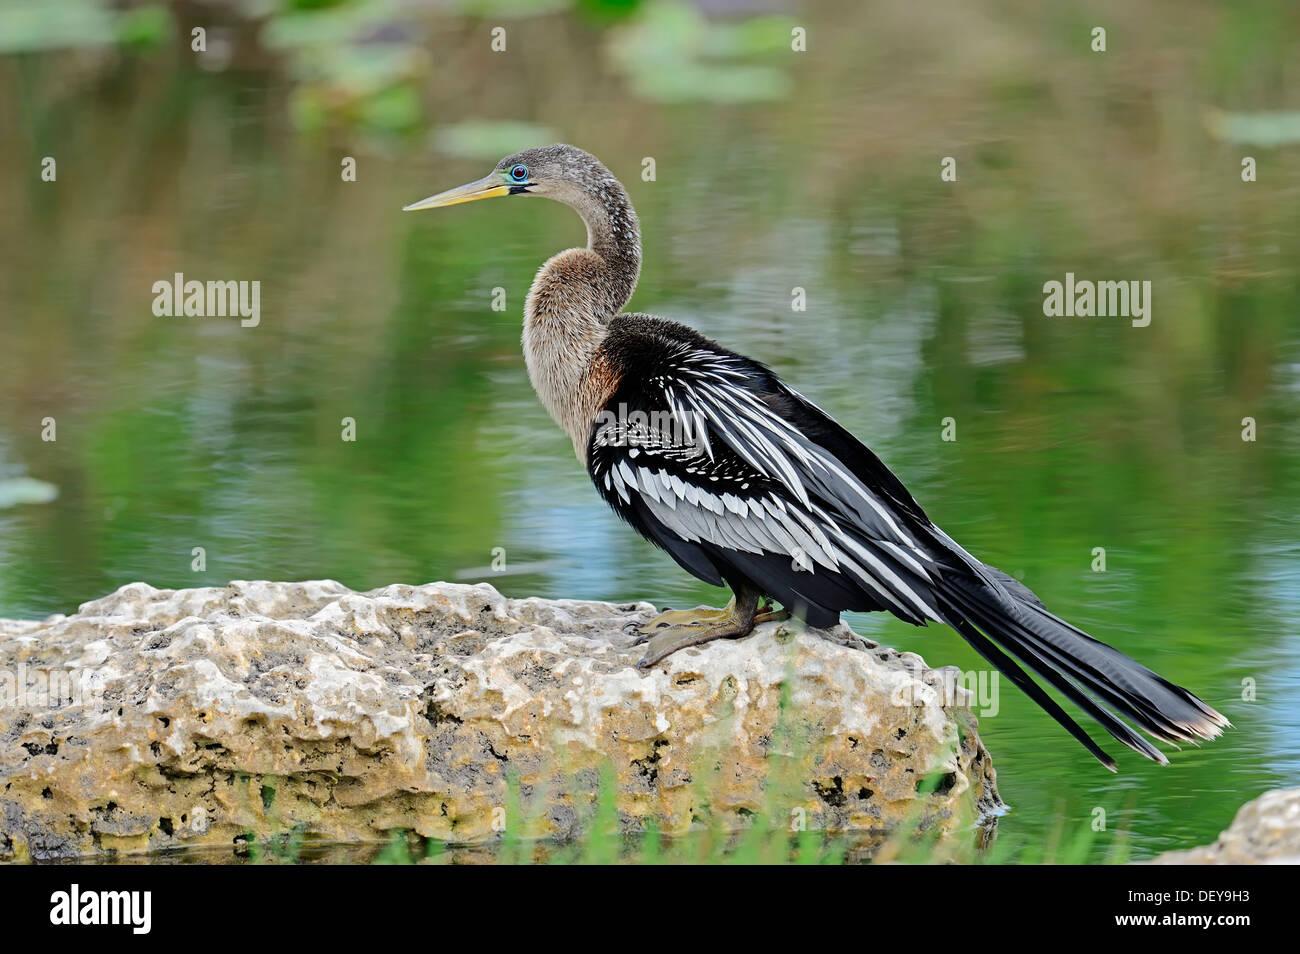 American Anhinga or Snake-Bird (Anhinga anhinga), female, Everglades-Nationalpark, Florida, United States - Stock Image